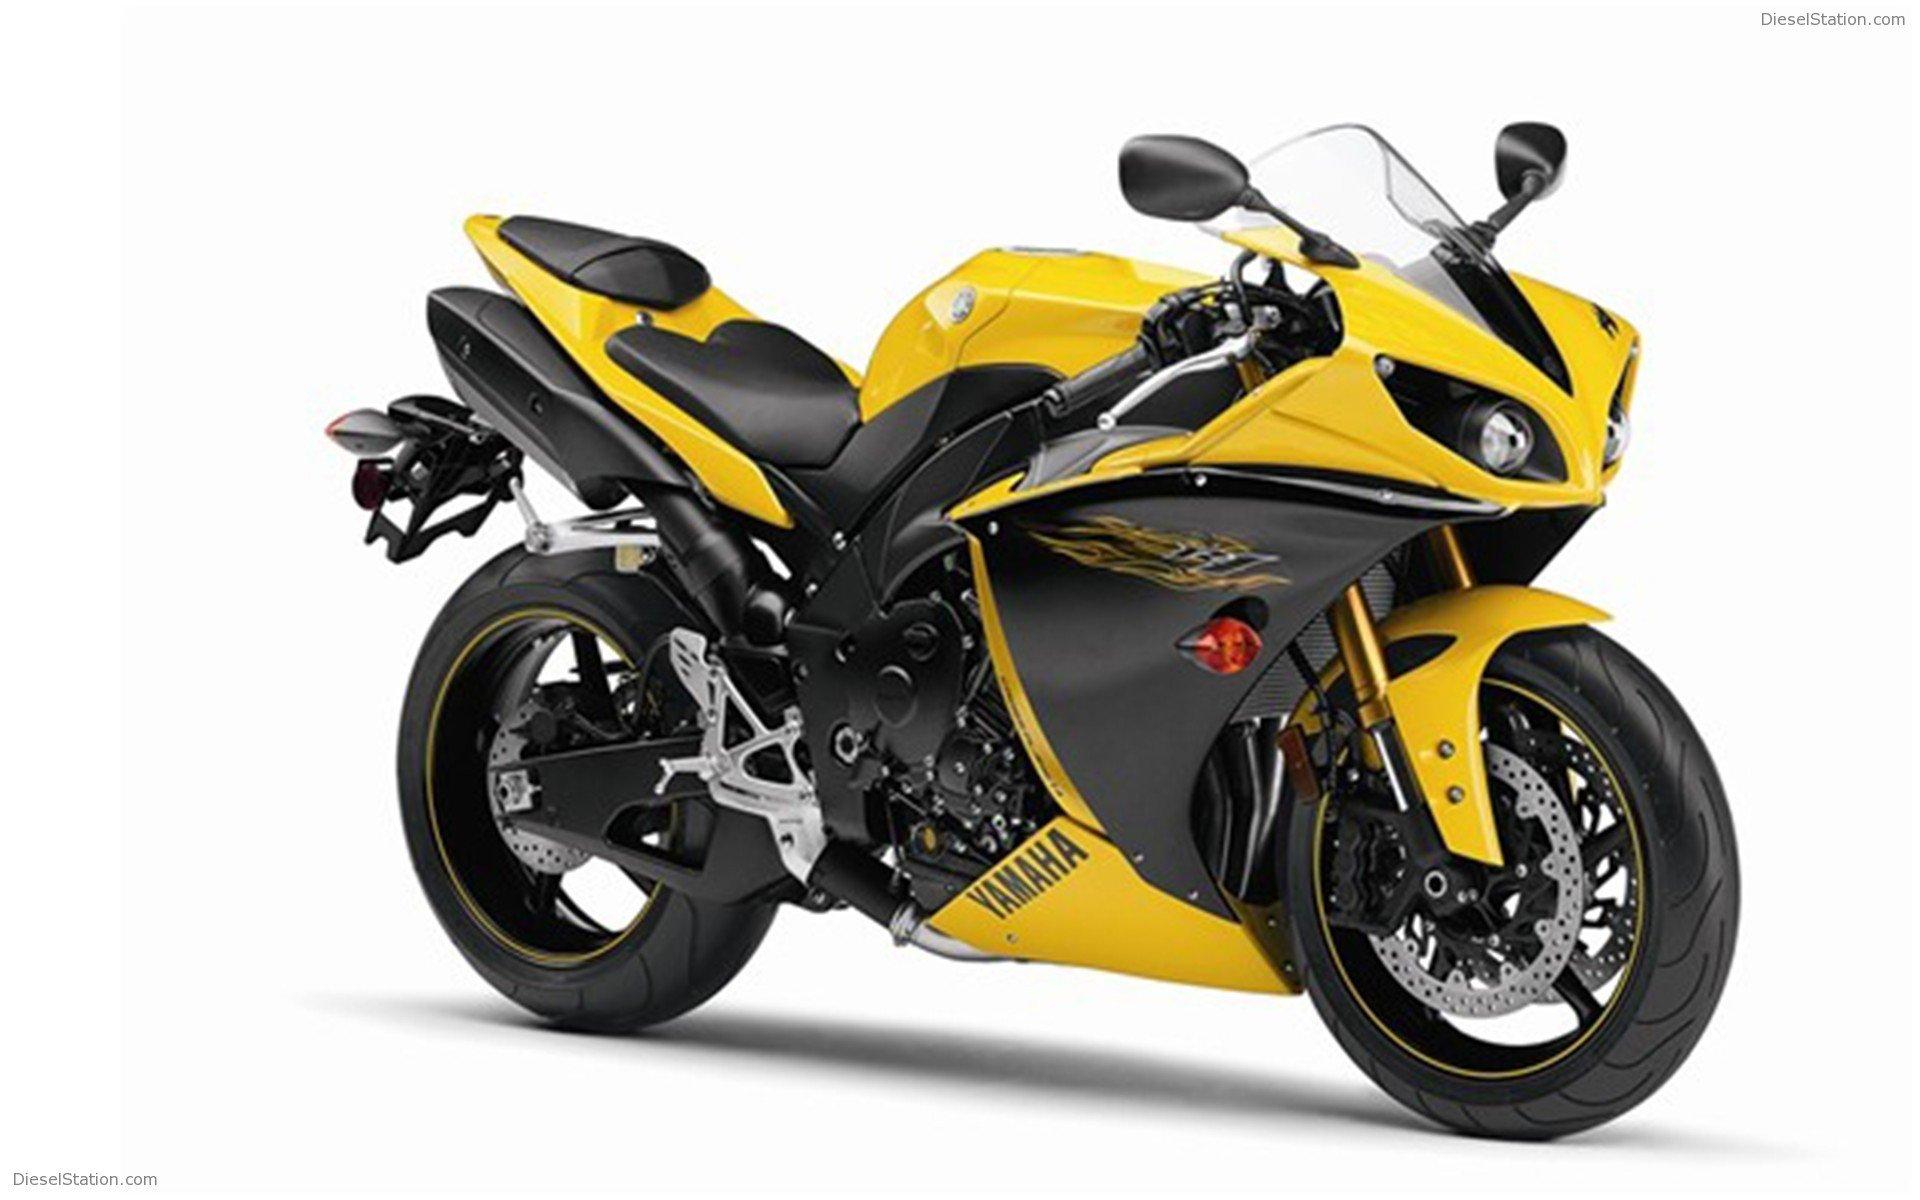 2009 Yamaha R1 Wallpaper 7081 Hd Wallpapers in Bikes   Imagescicom 1920x1200